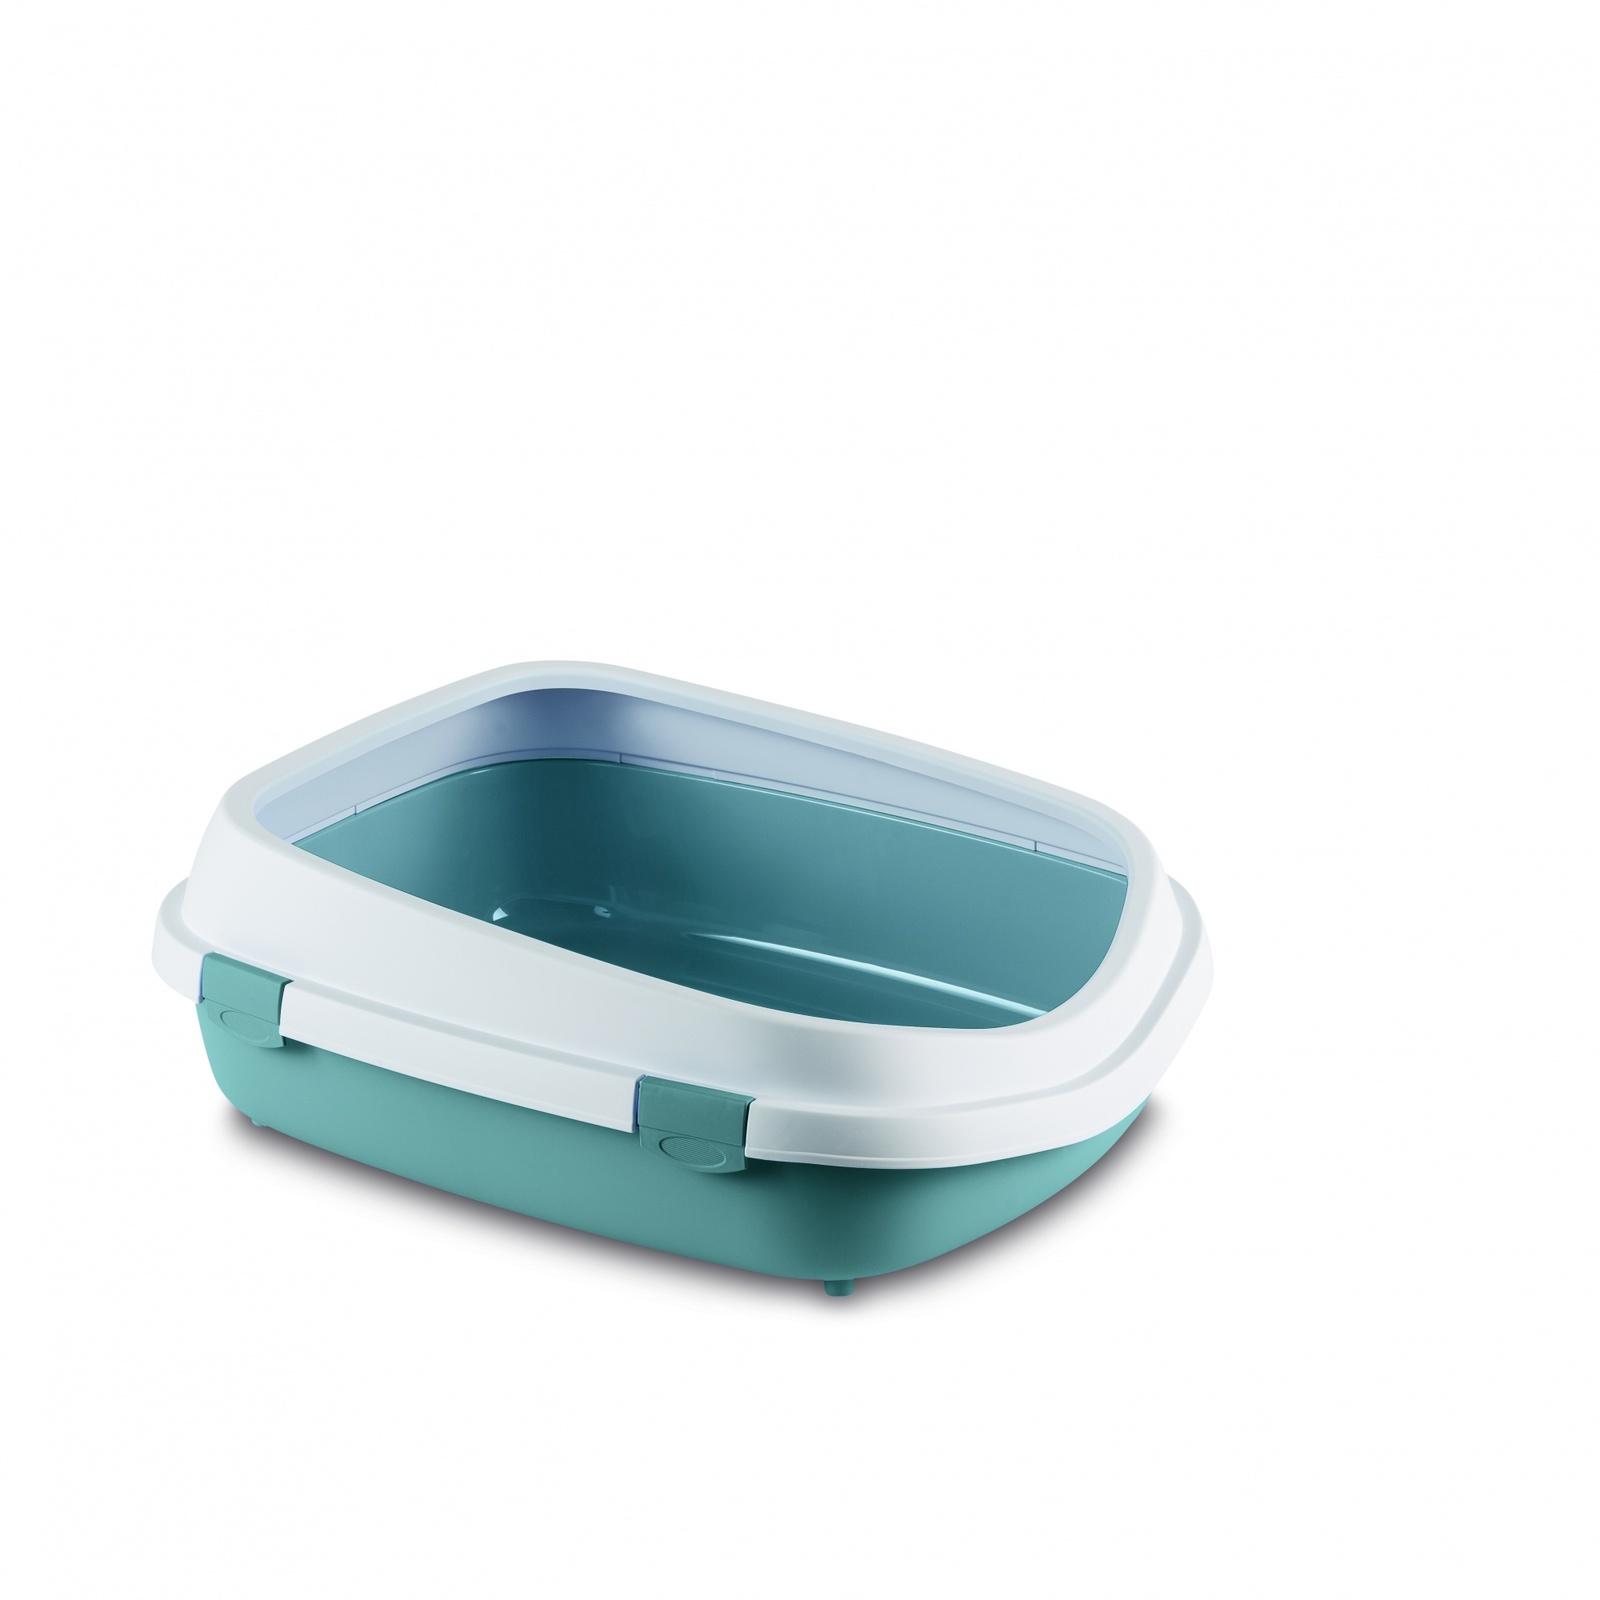 Stefanplast Stefanplast туалет Queen с рамкой, синий, 55х71х24,5 см (1,62 кг)